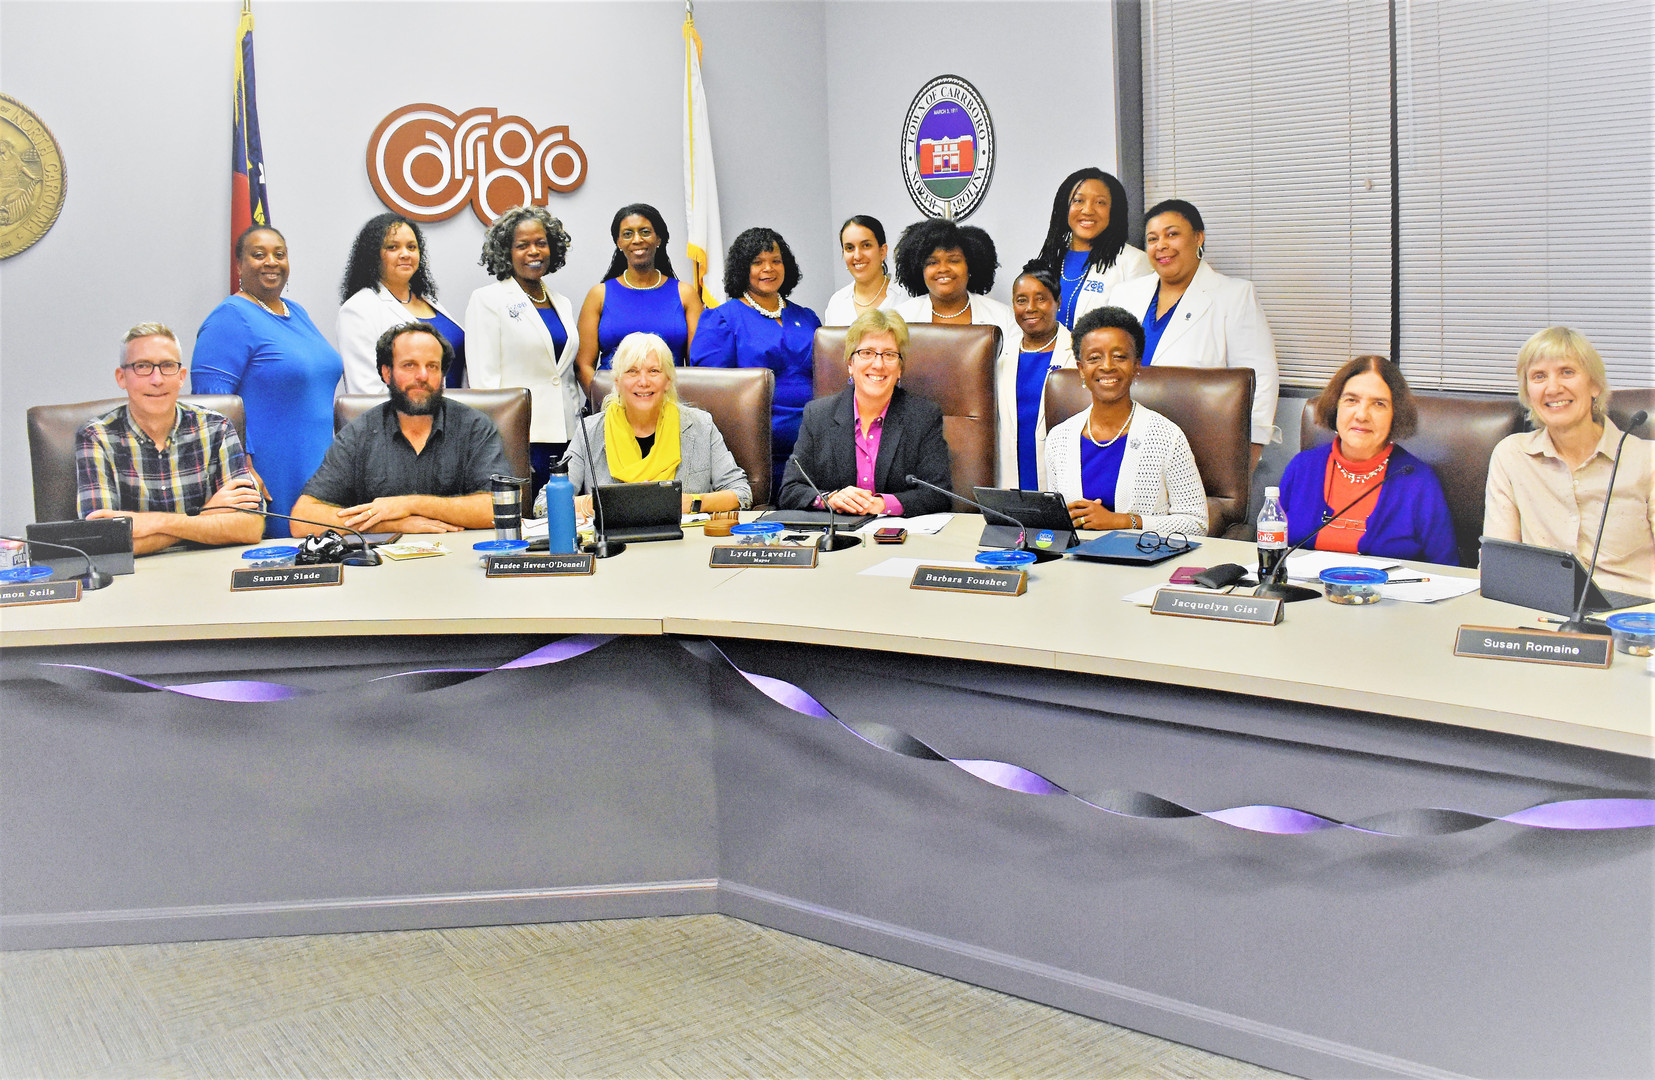 Zetas and Carrboro Town Council